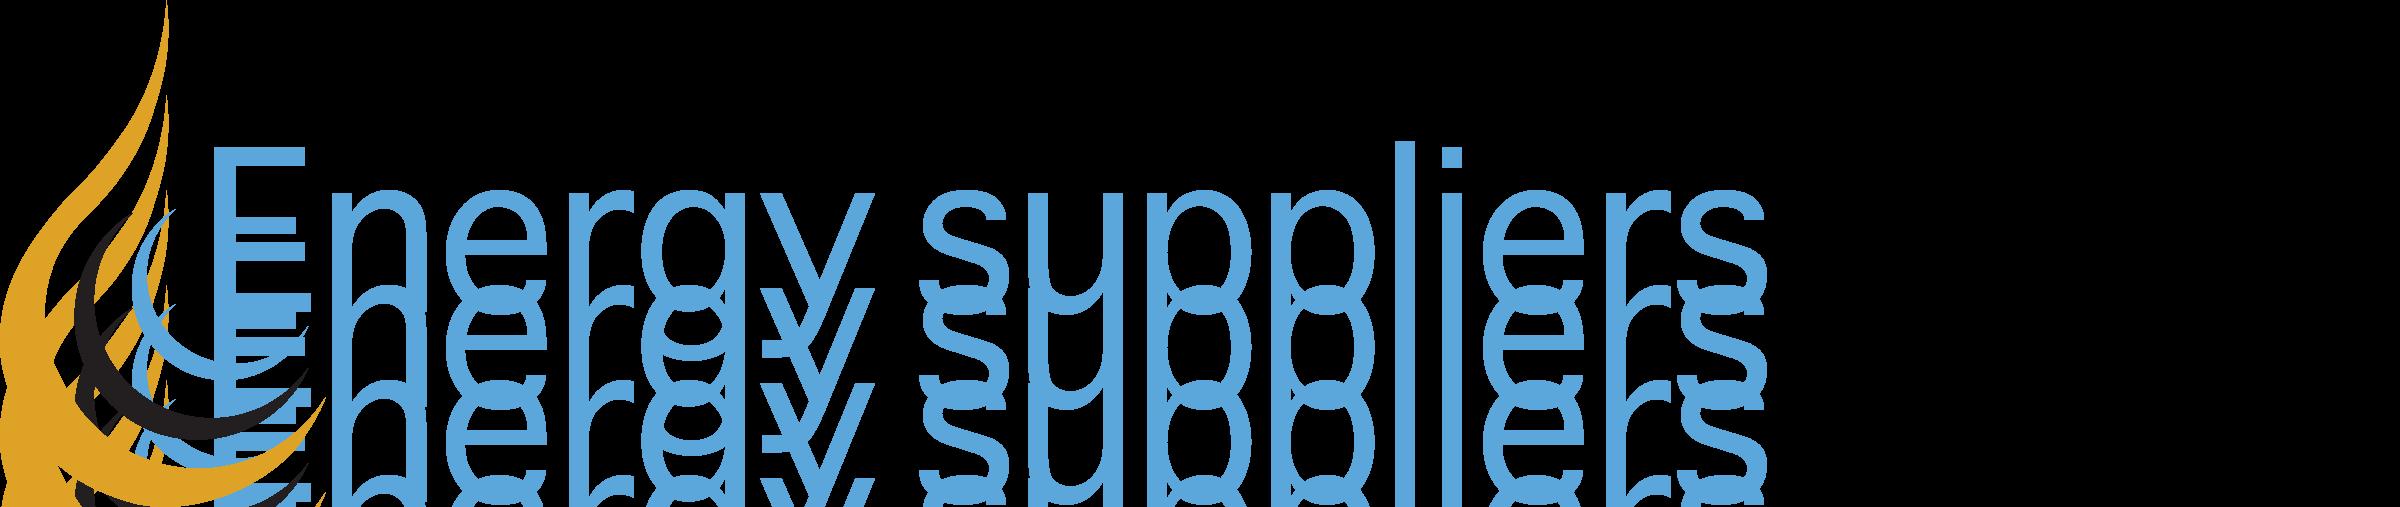 EnergySuppliersLogo